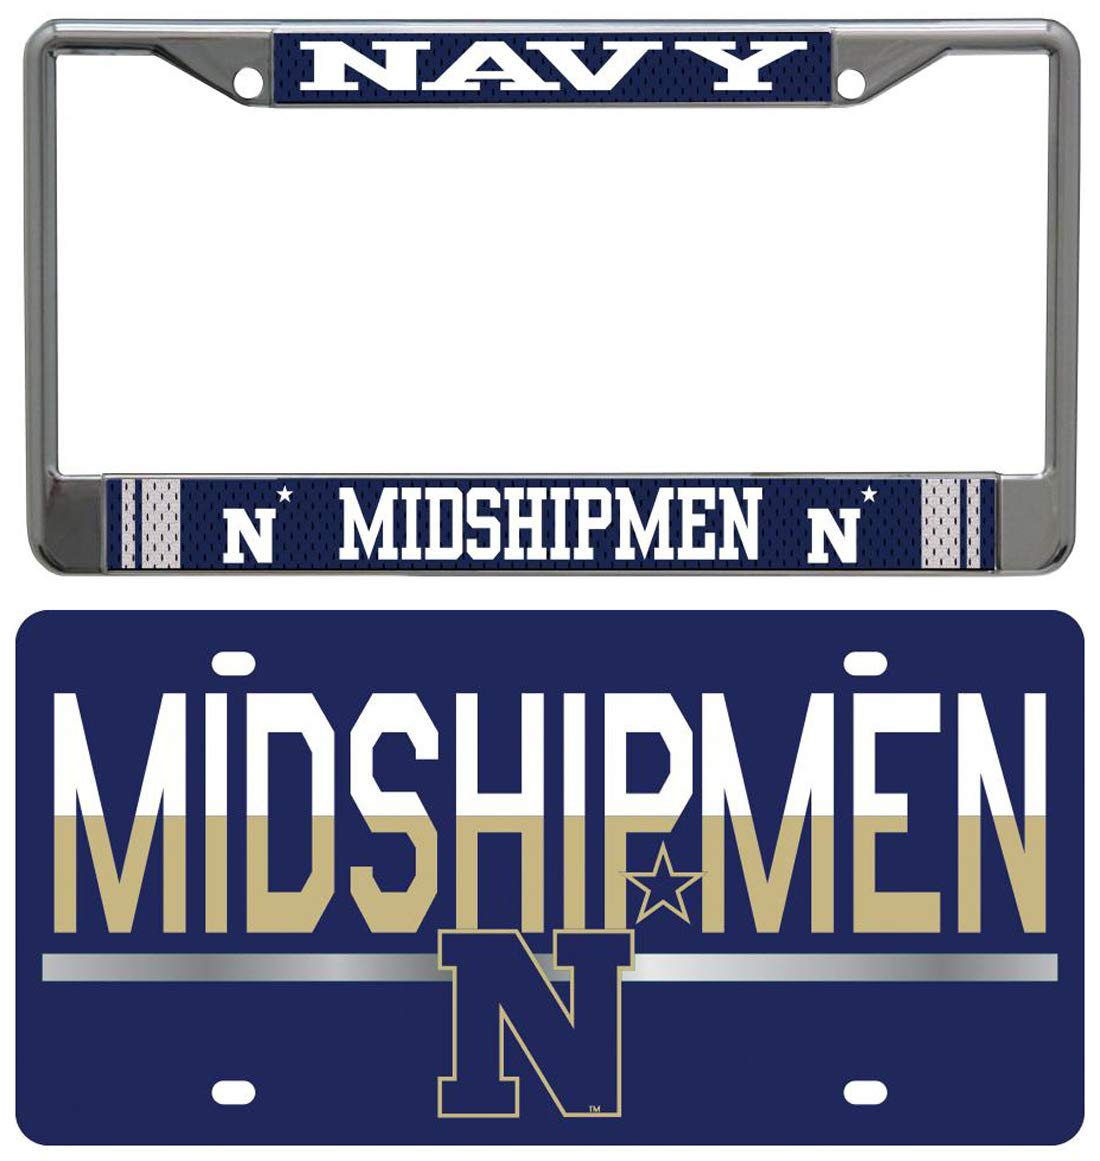 WinCraft アメリカ海軍アカデミー海軍 海軍 中間船員 ナンバープレートフレームとナンバープレートギフトセット